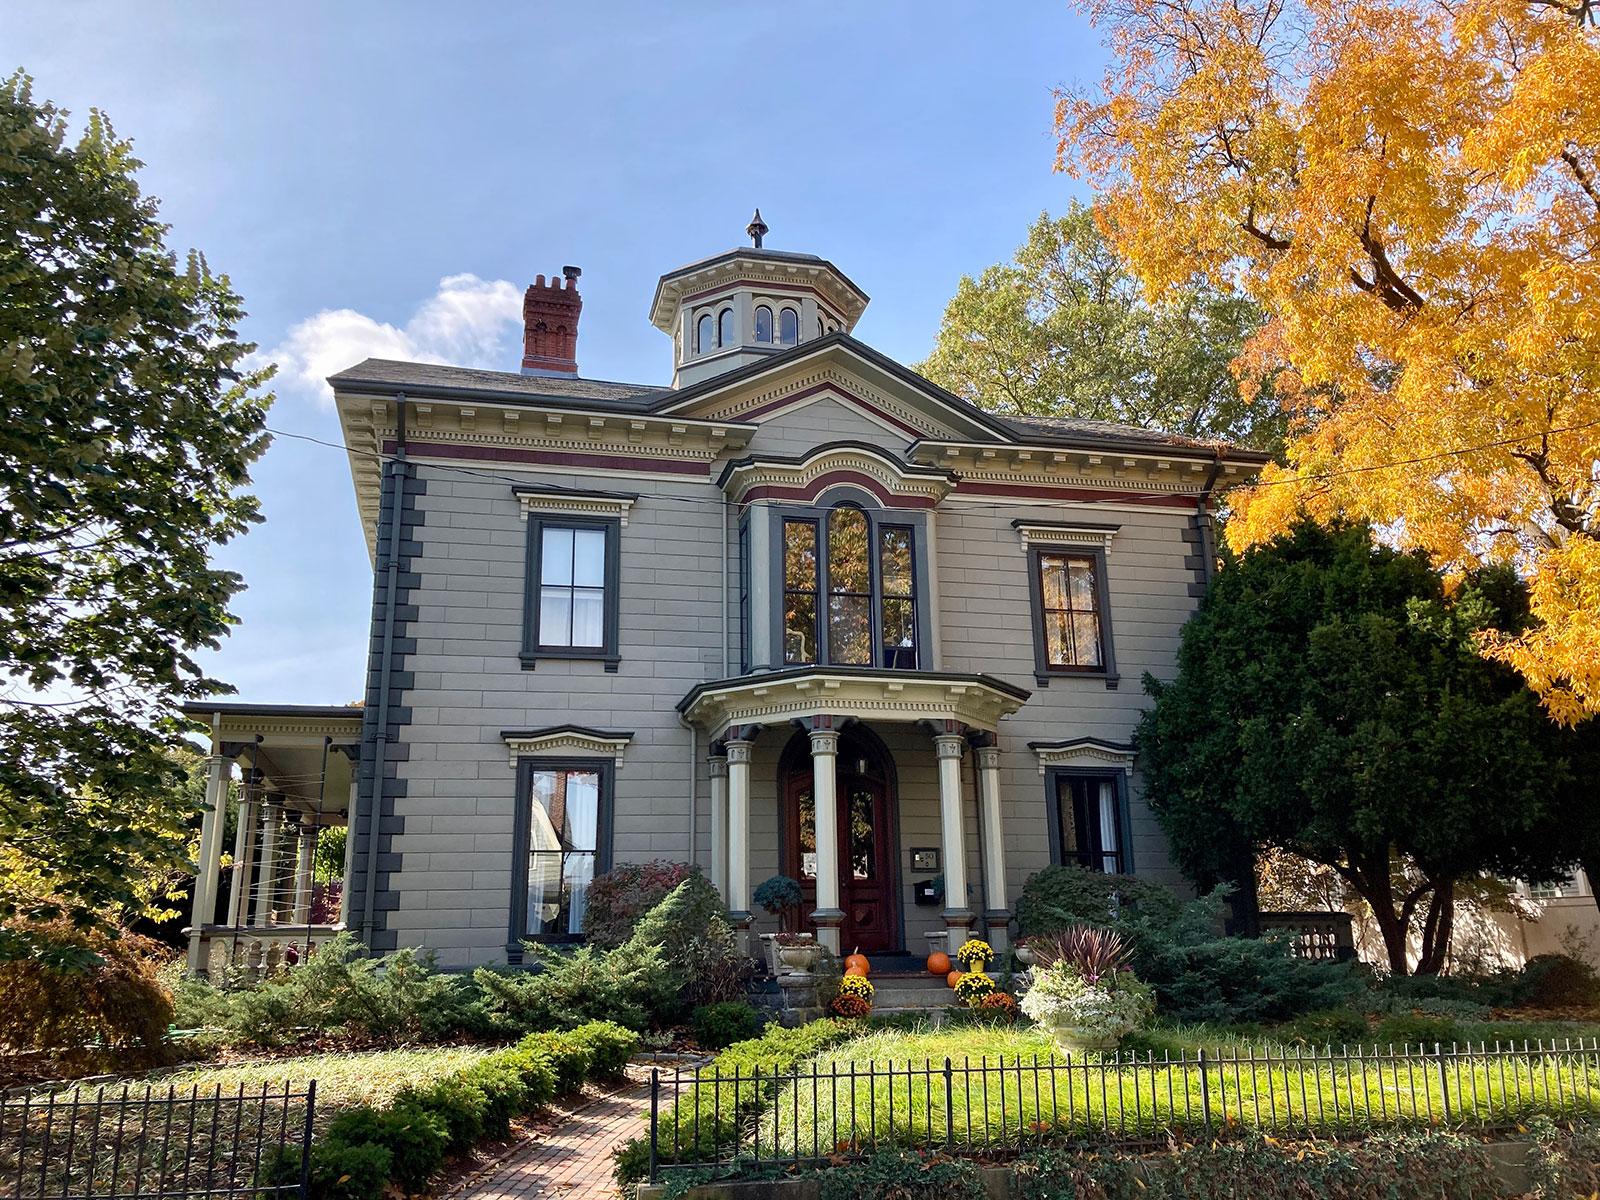 The Taylor House in Jamaica Plain